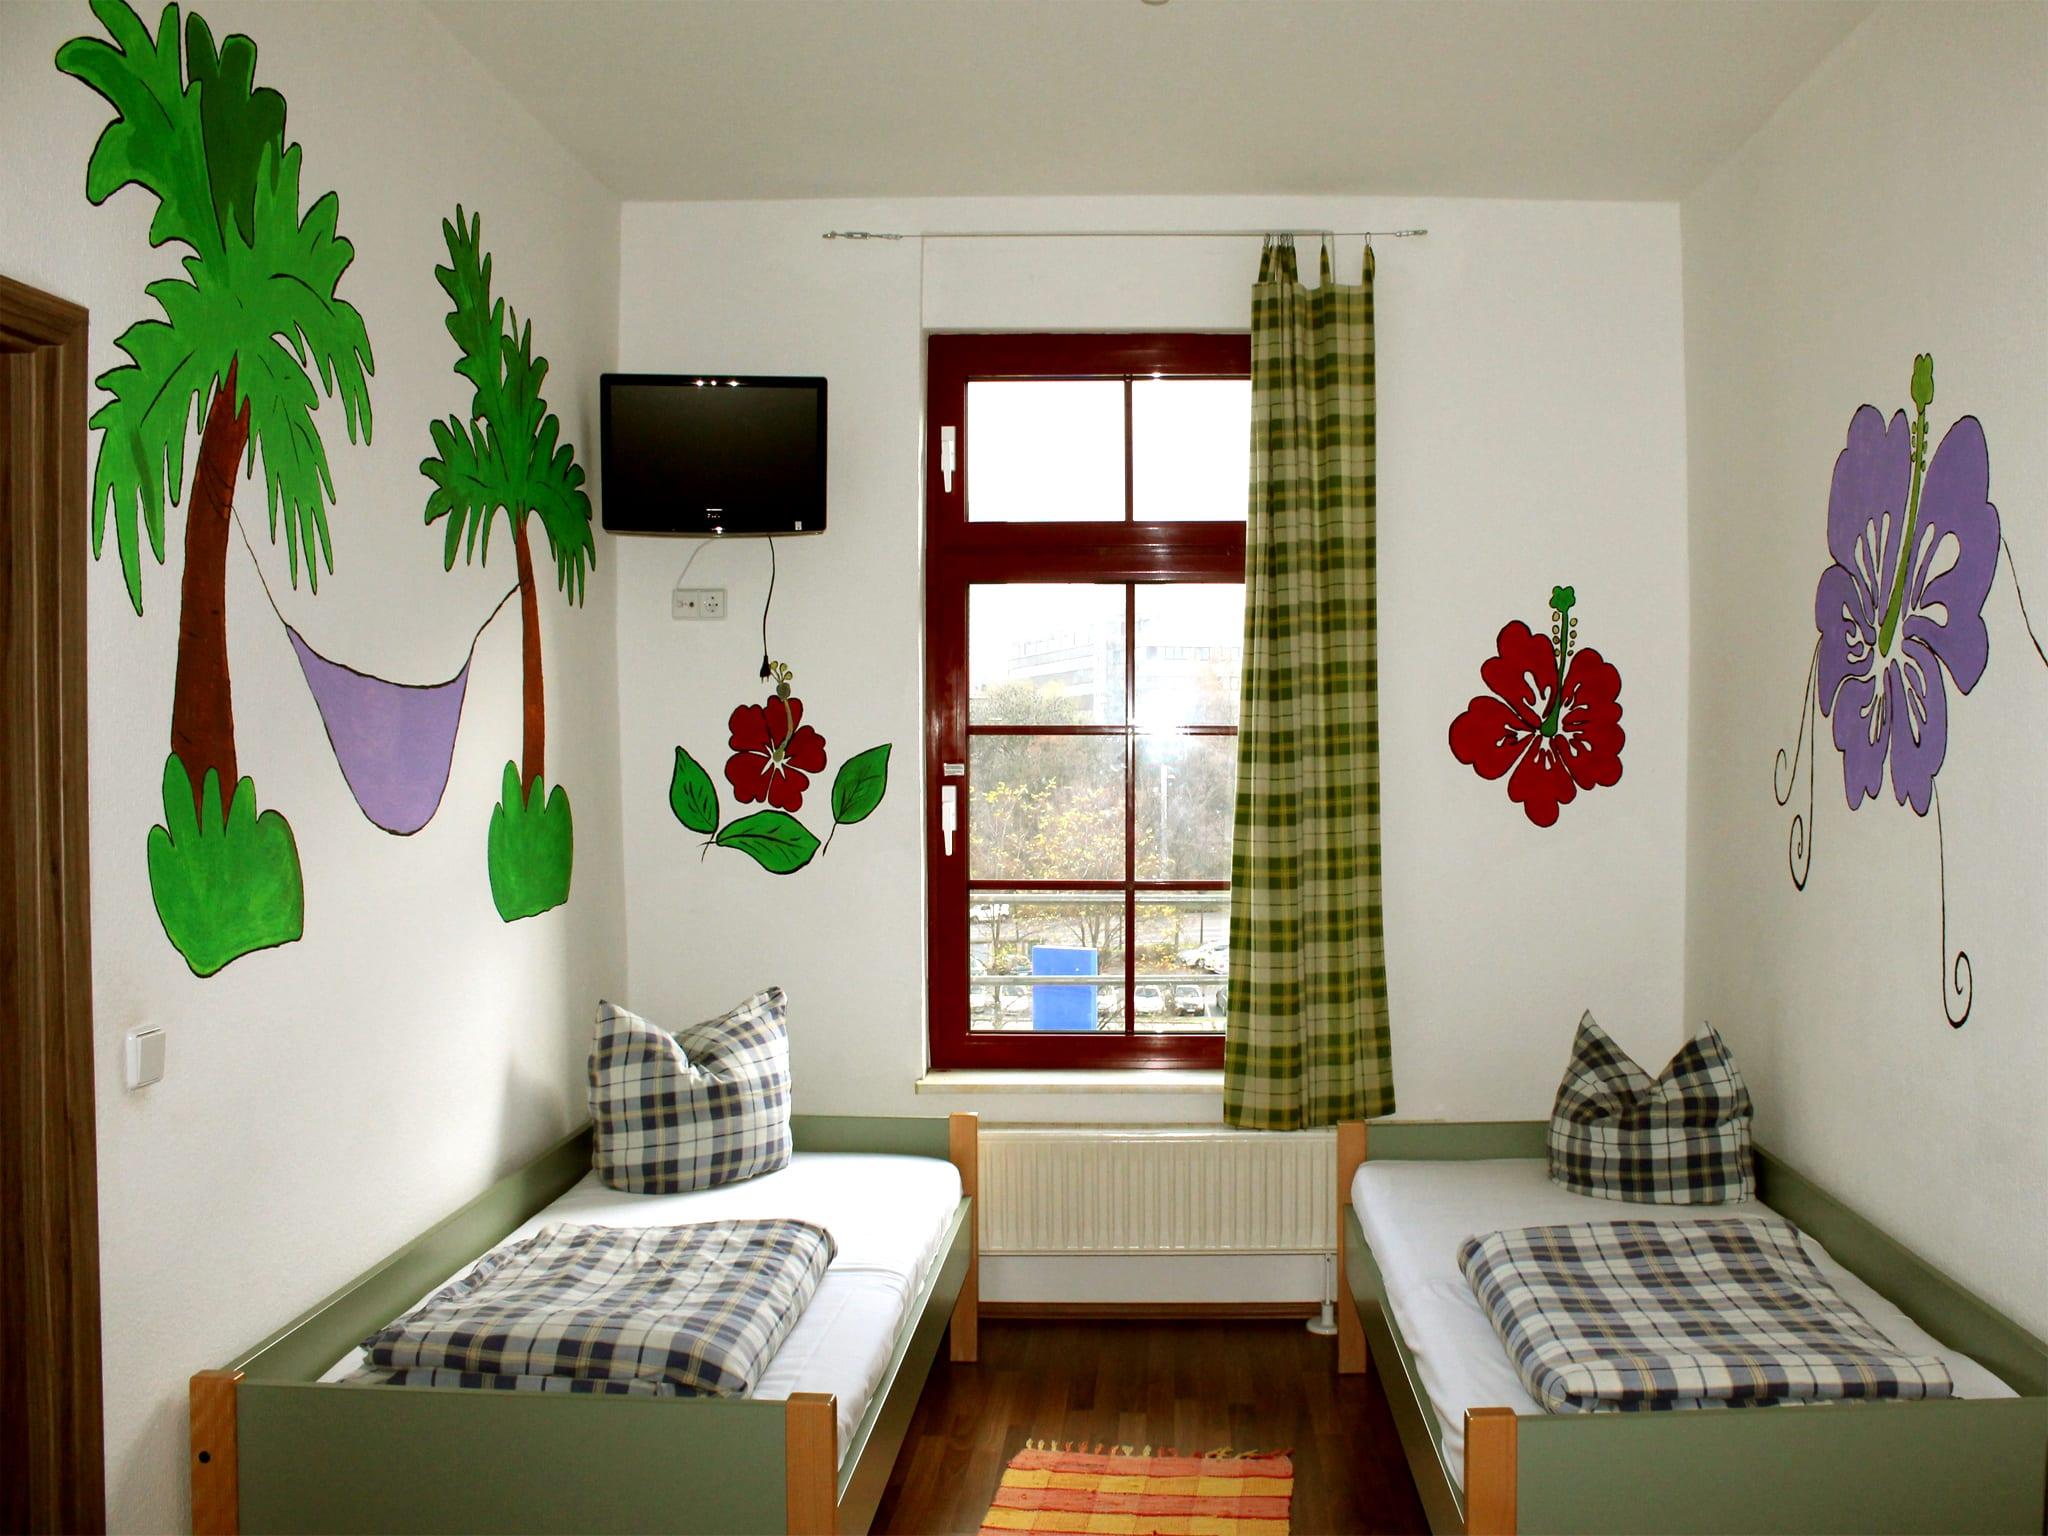 Sleepy Lion Hostel, Youth Hotel & Apartments